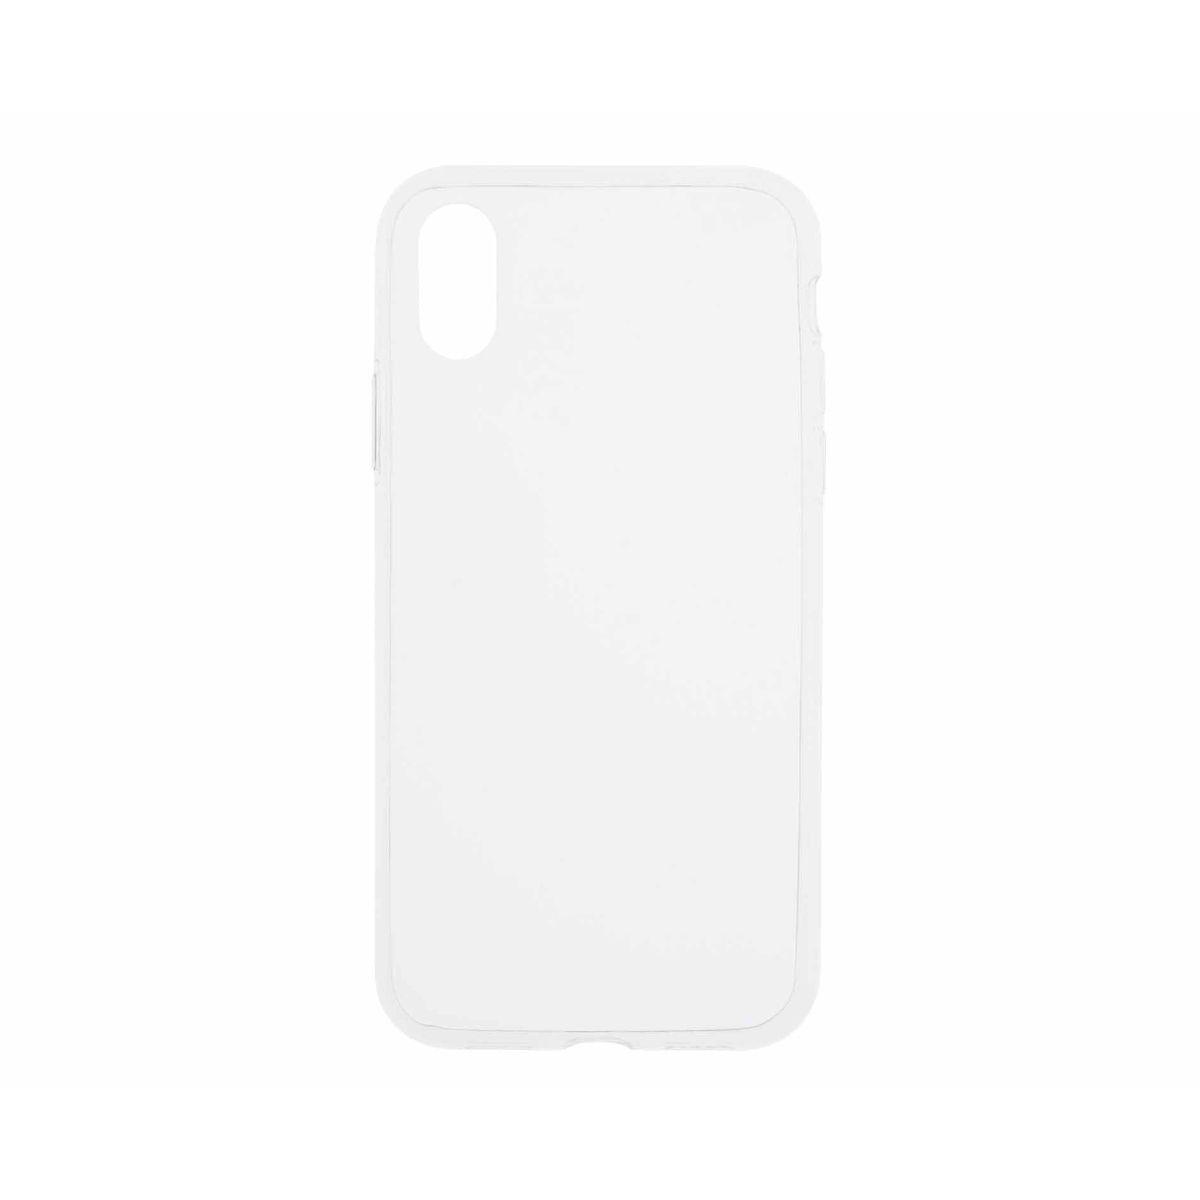 Case it iPhone X/XS Protective Case